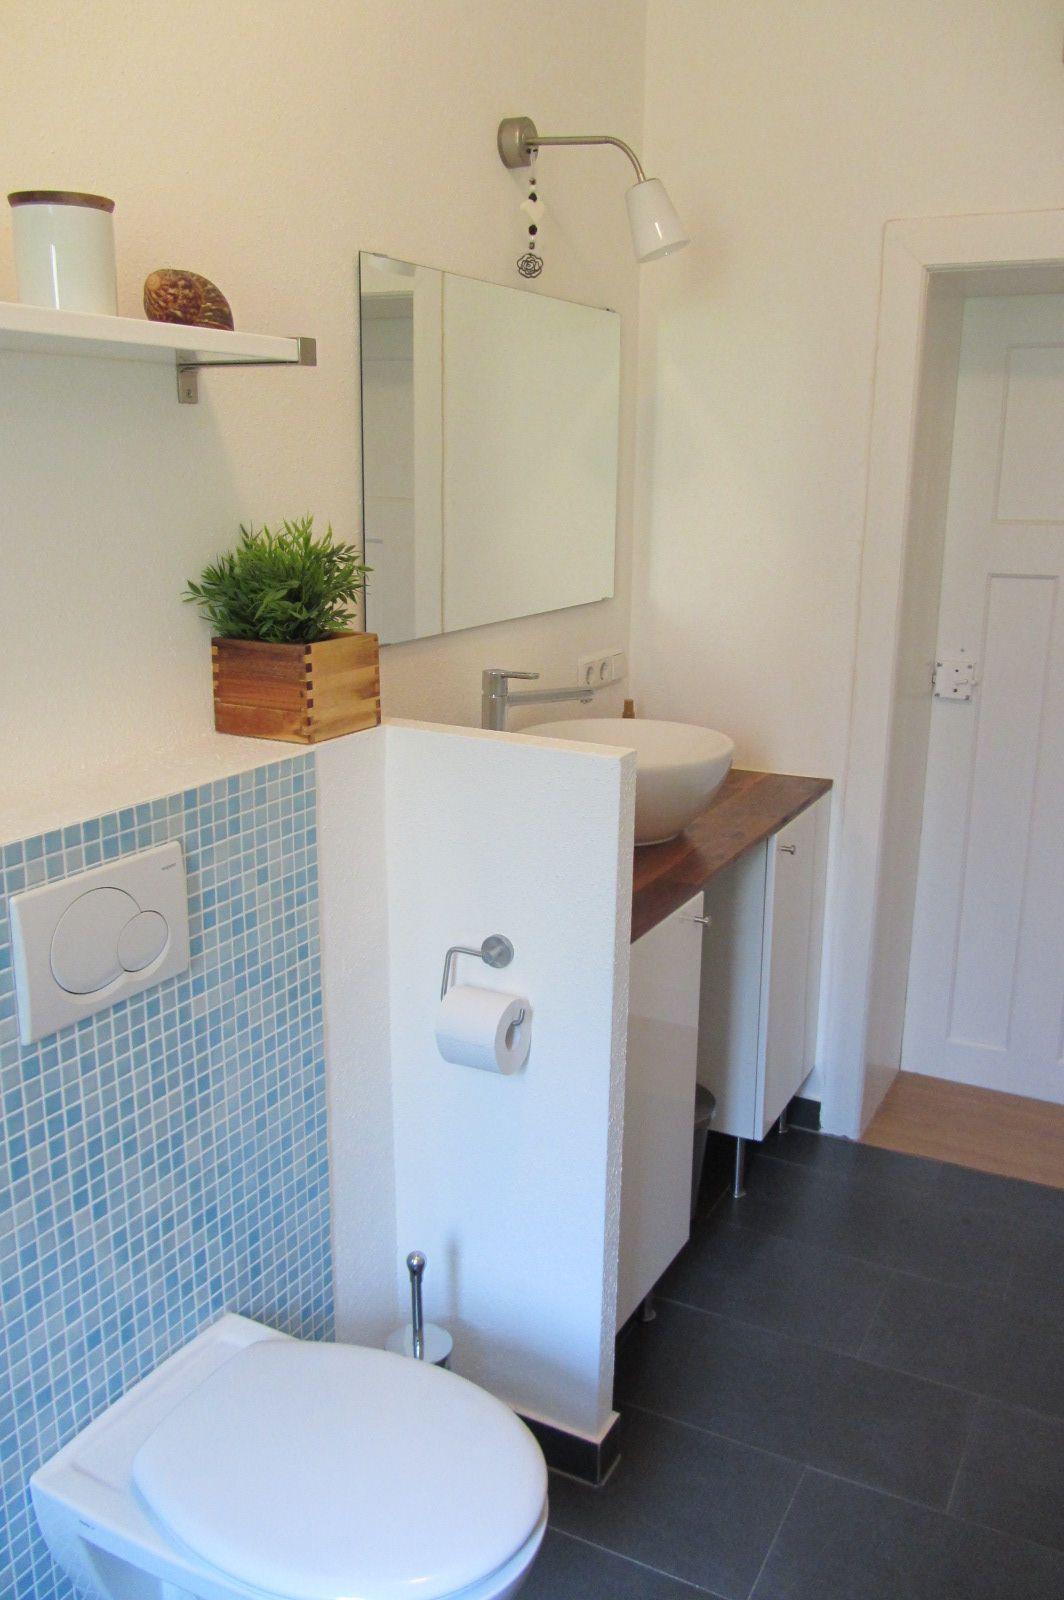 kuhles badezimmer neu planen eingebung bild oder ffadafabbfaa